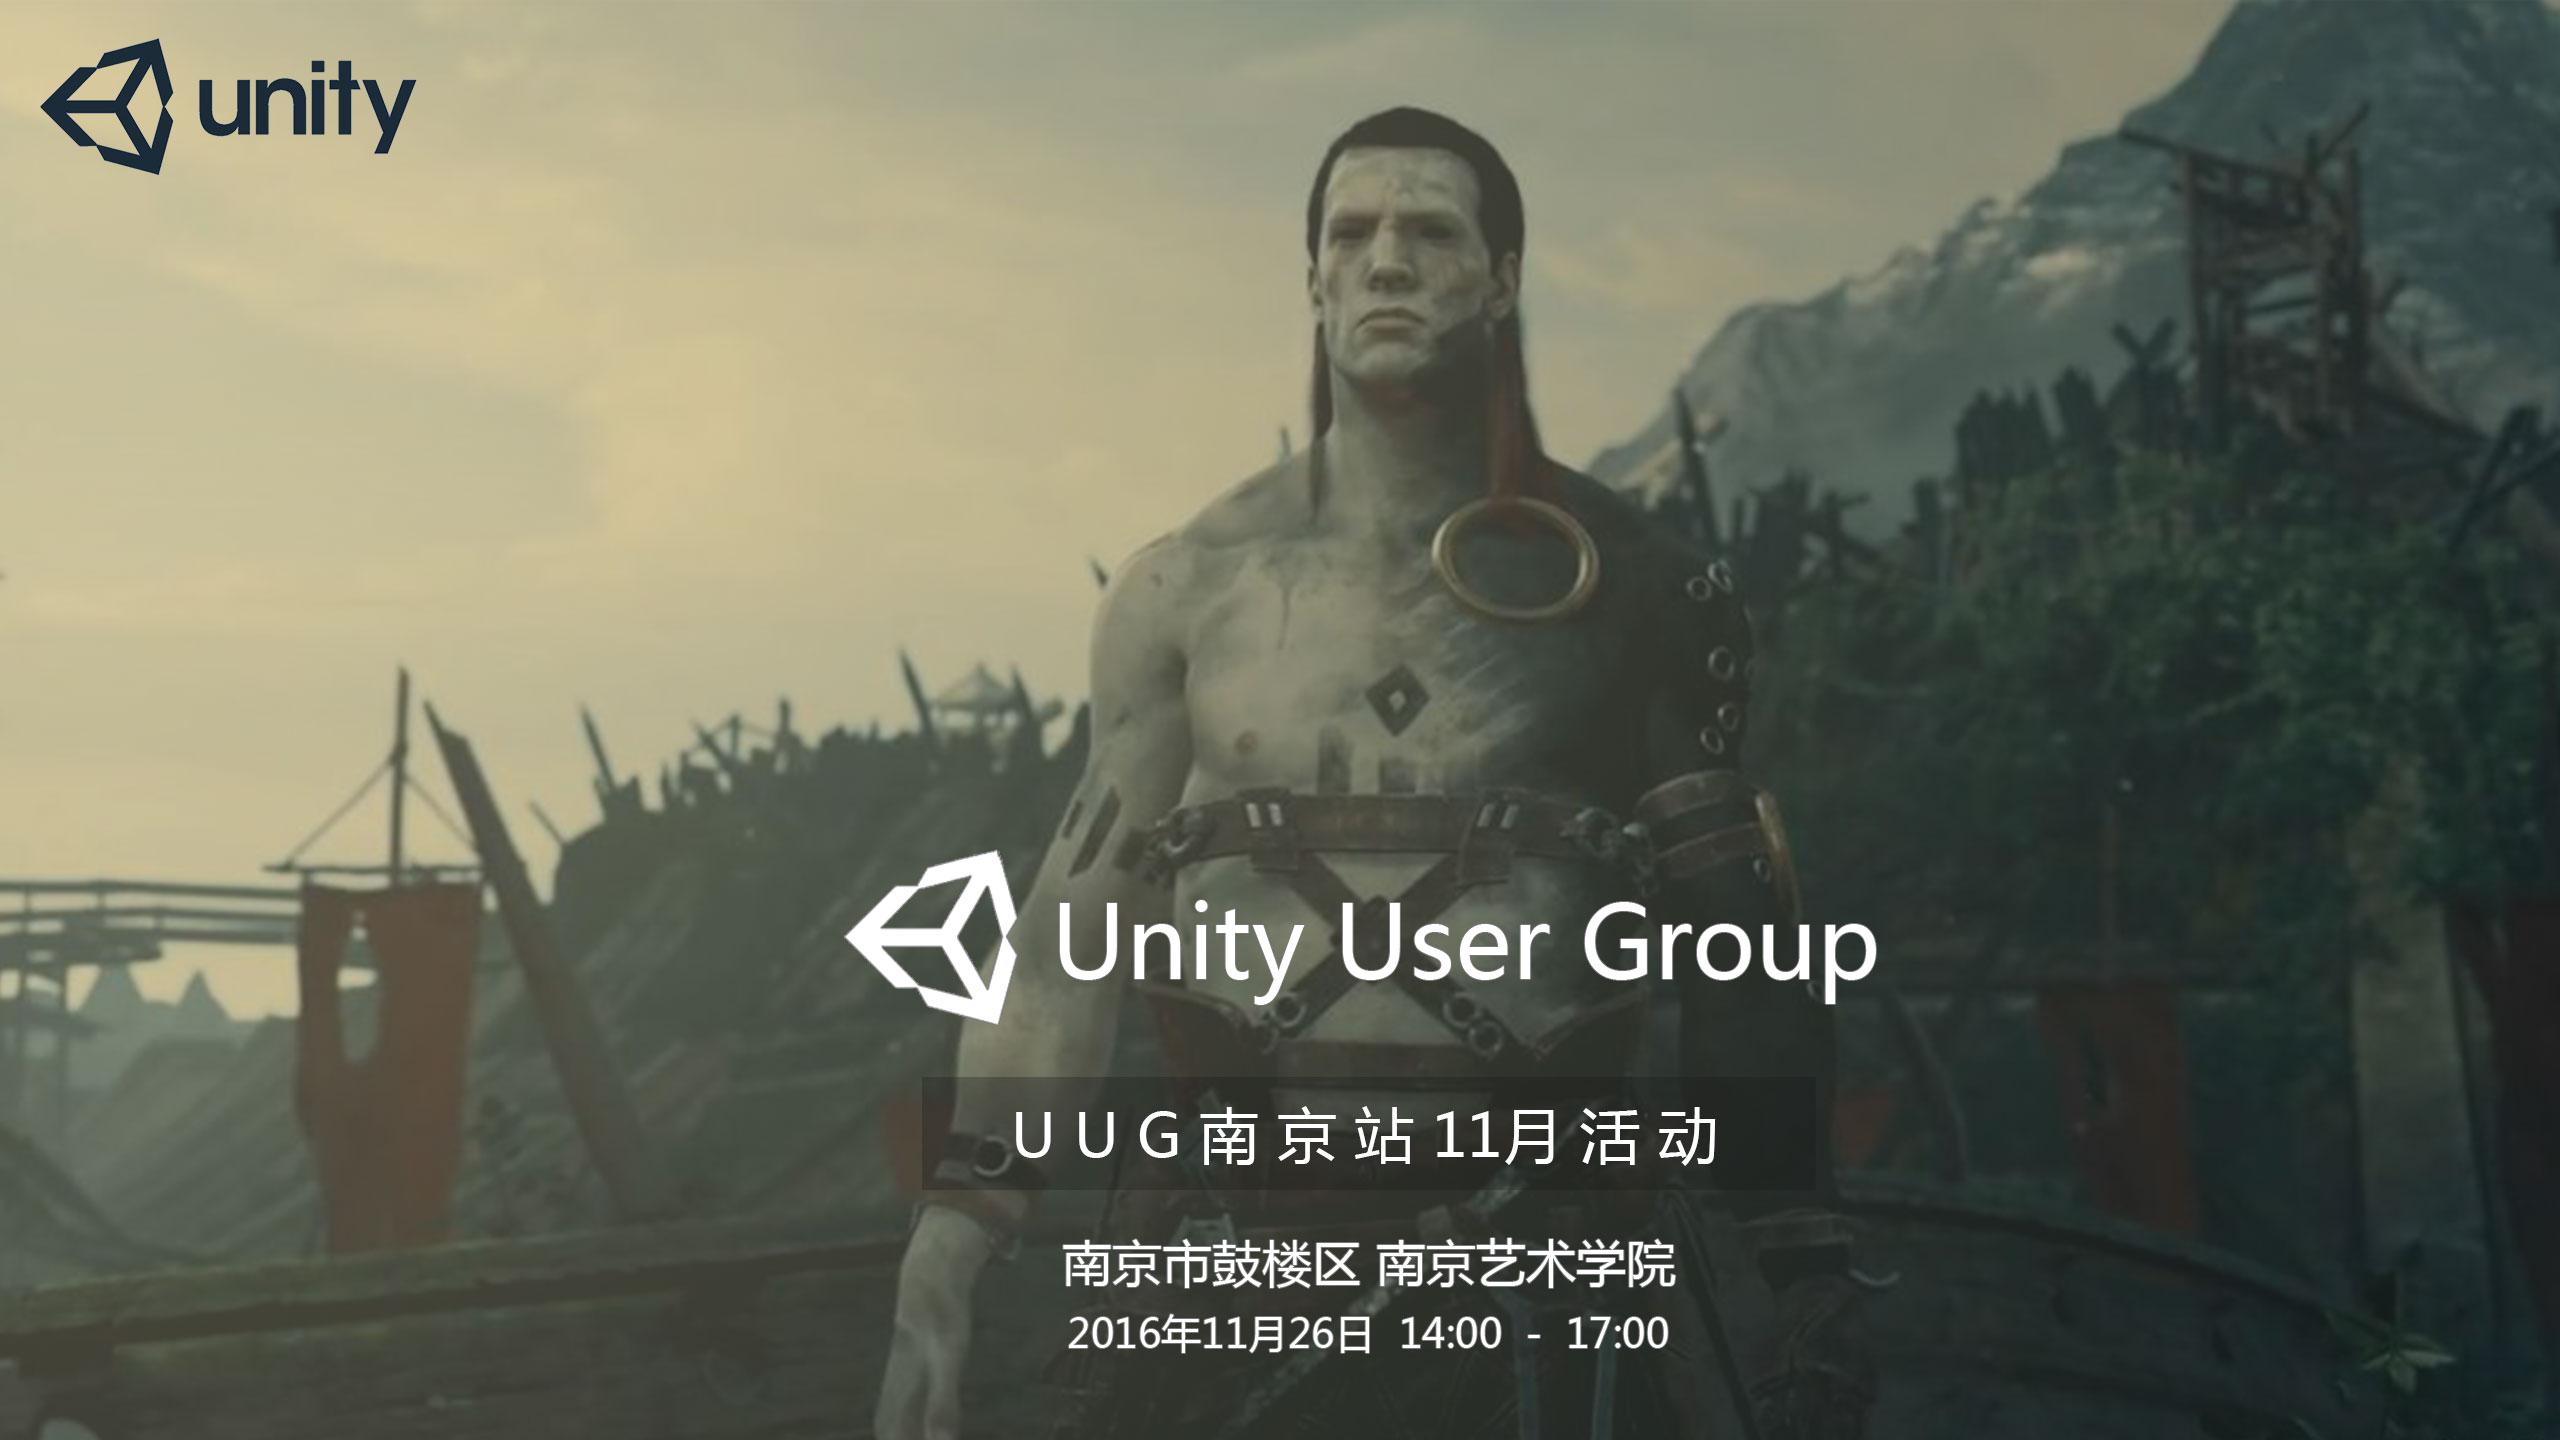 16.11.26 UUG南京 Unity x Art